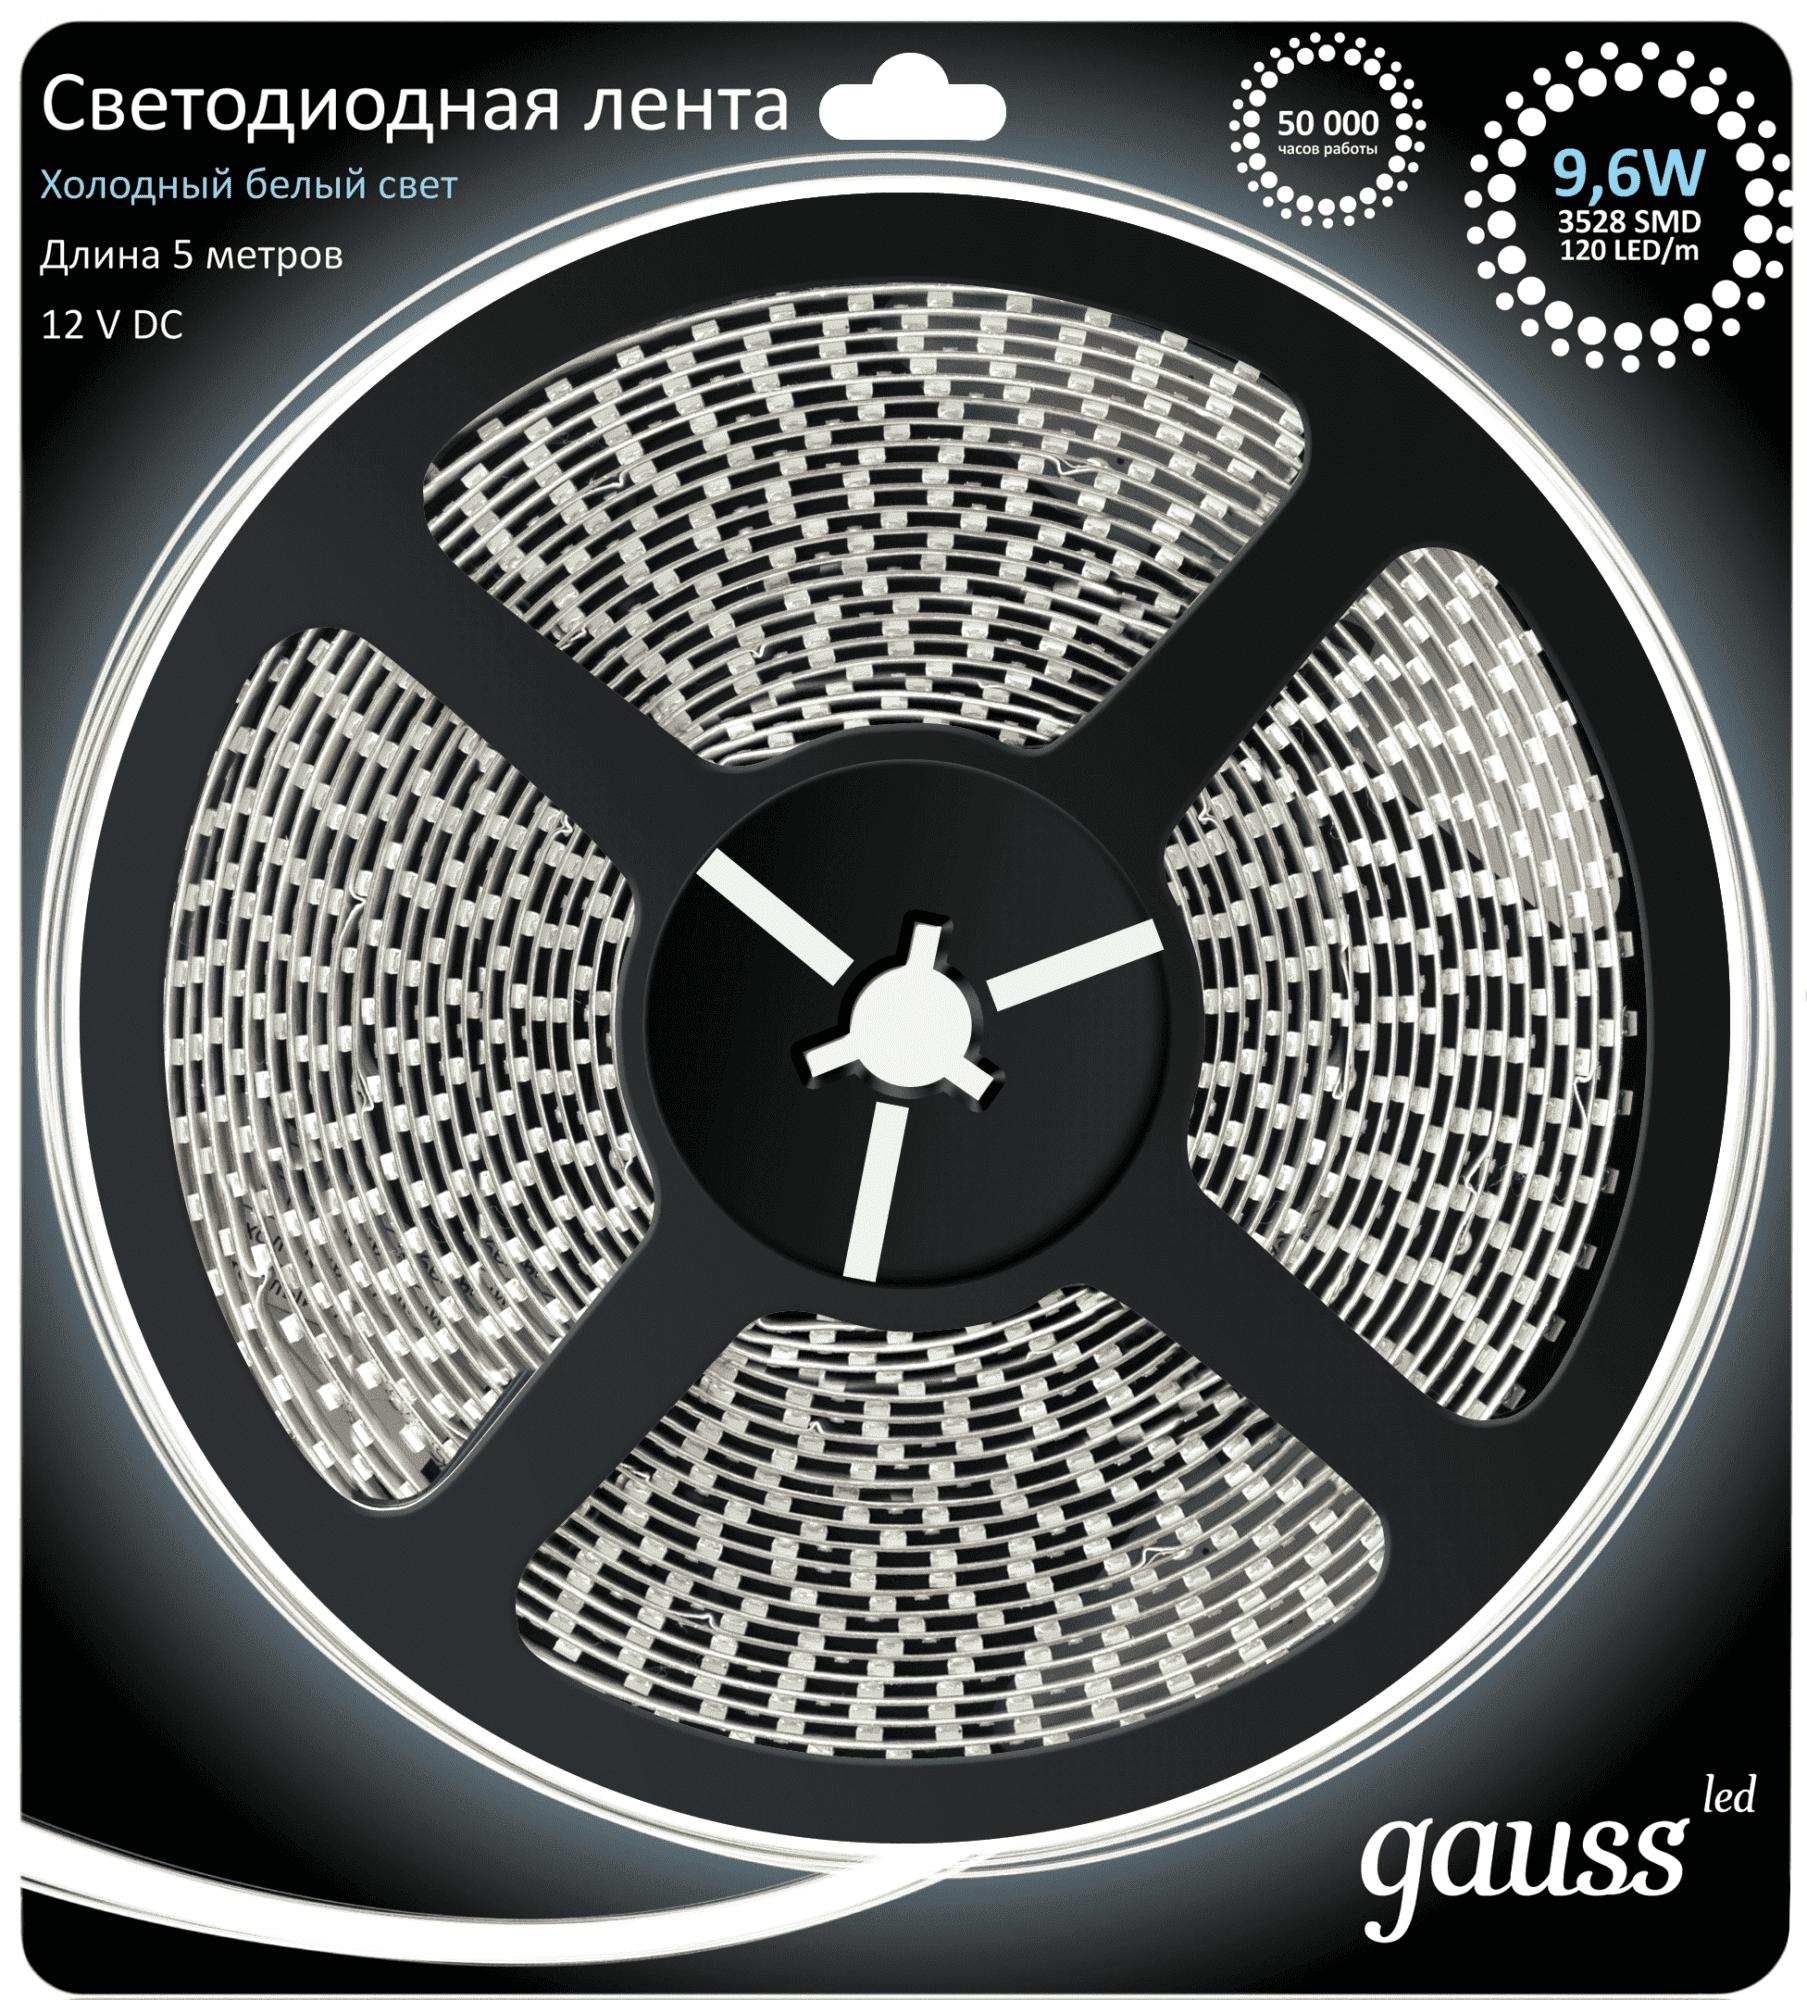 Светодиодная лента Gauss LED 2835/120-SMD 9.6W  12V DC холодный белый IP66 (блистер 5м) арт. 311000310